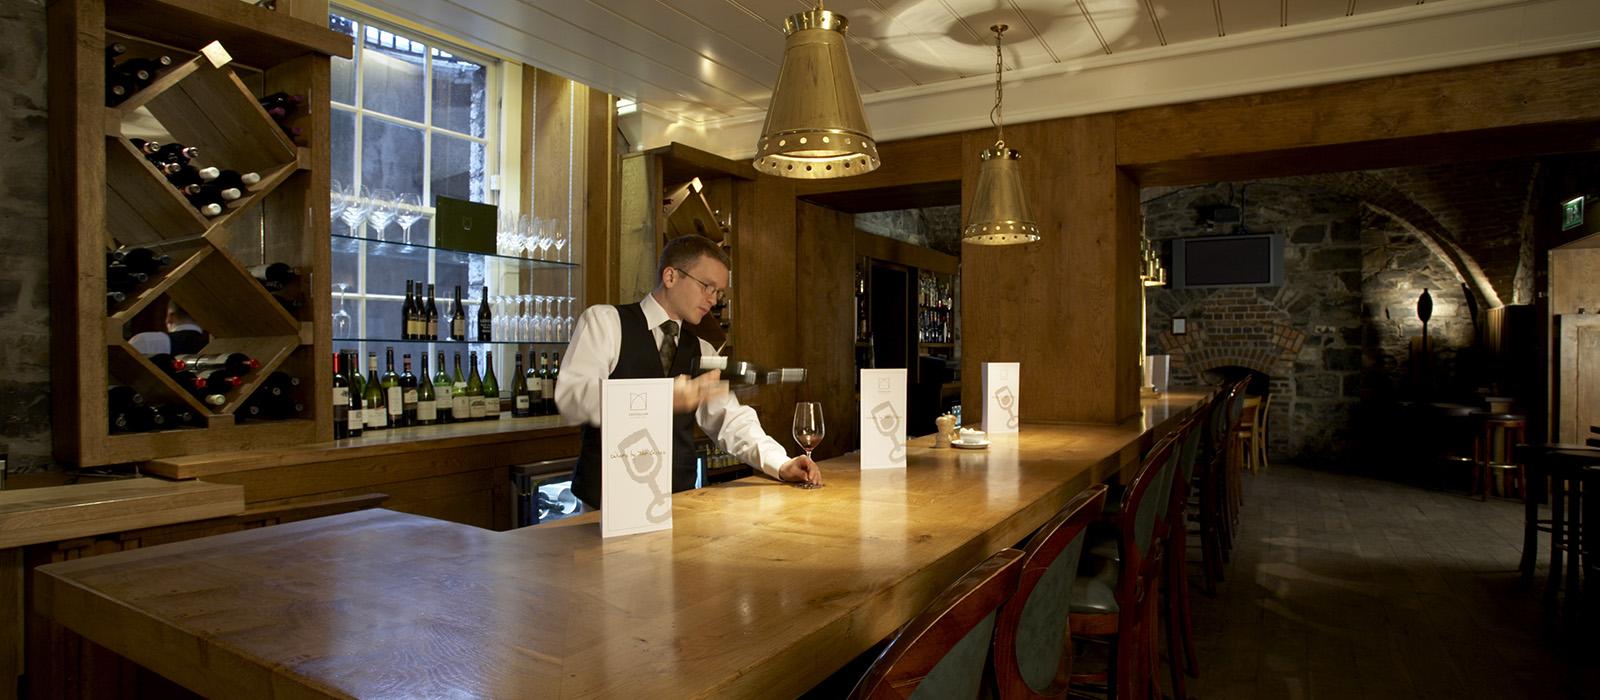 5 Star Hotels Ireland 5 Star Hotels Dublin The Merrion